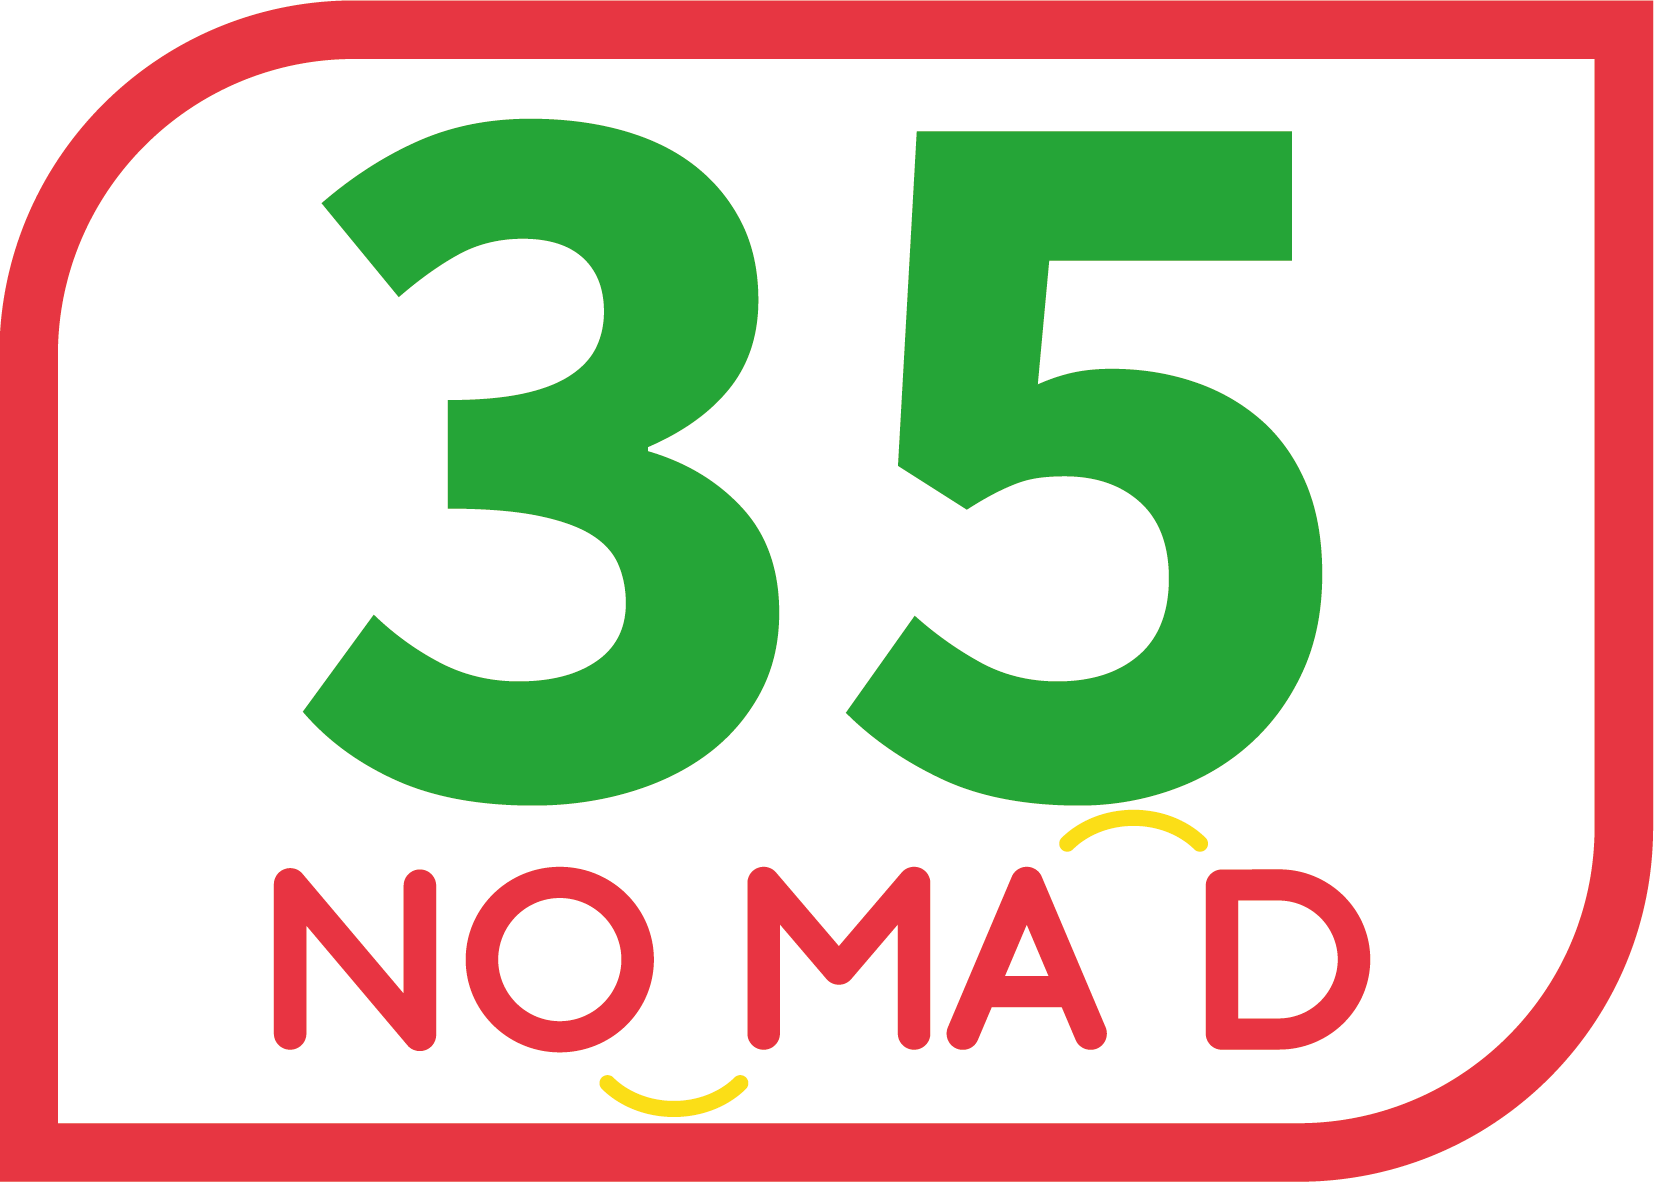 Nomad 35